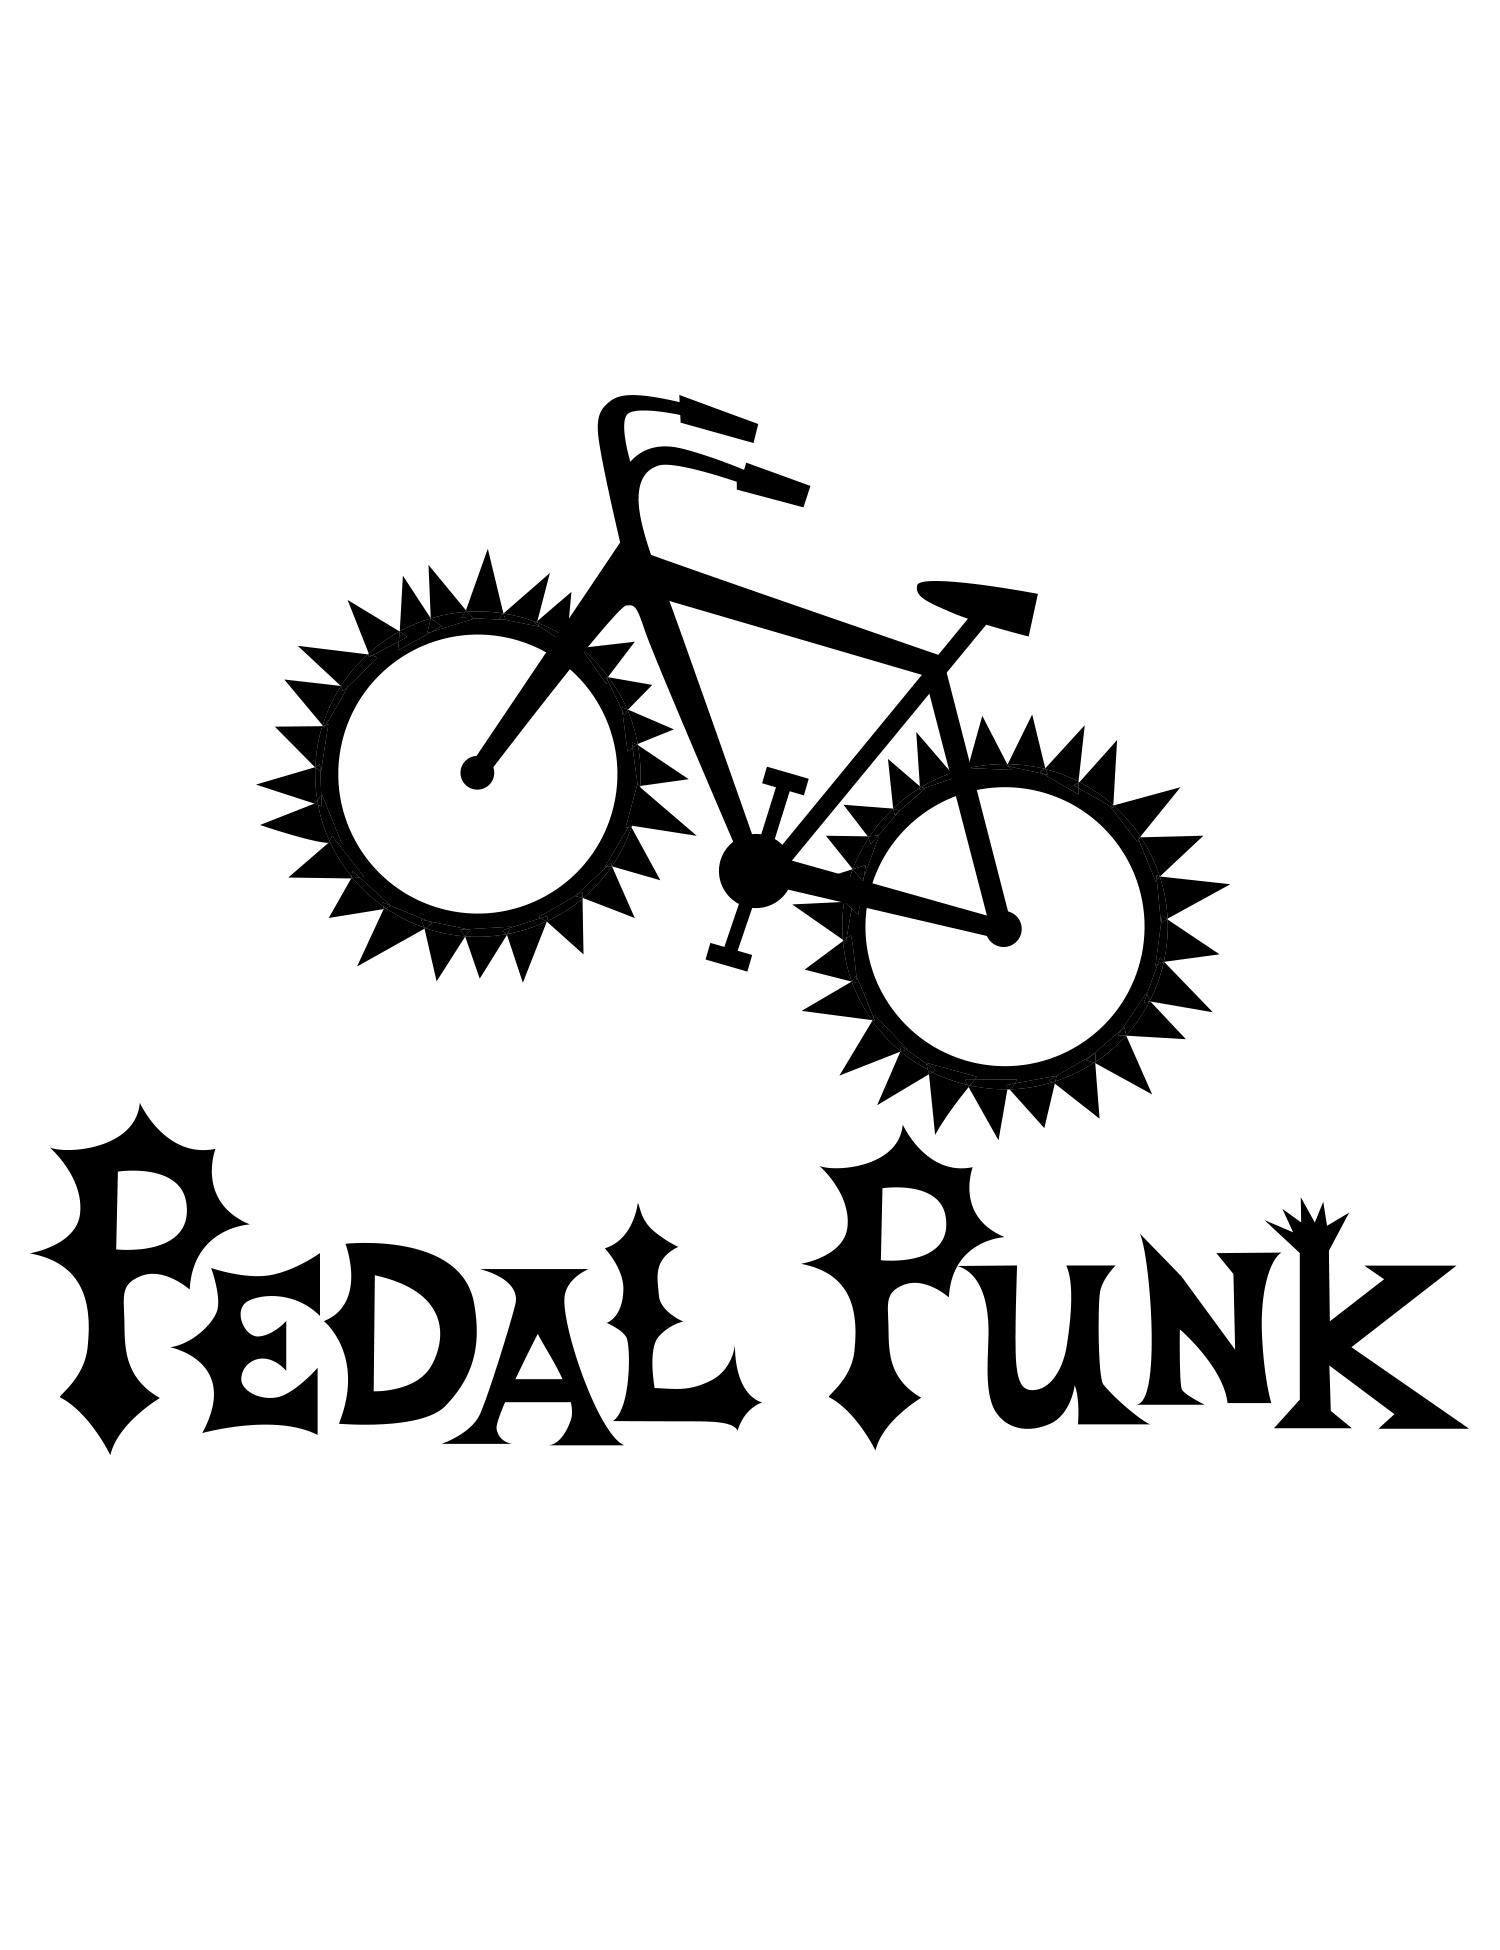 pedal_punk_bicycles_andi_bird.png